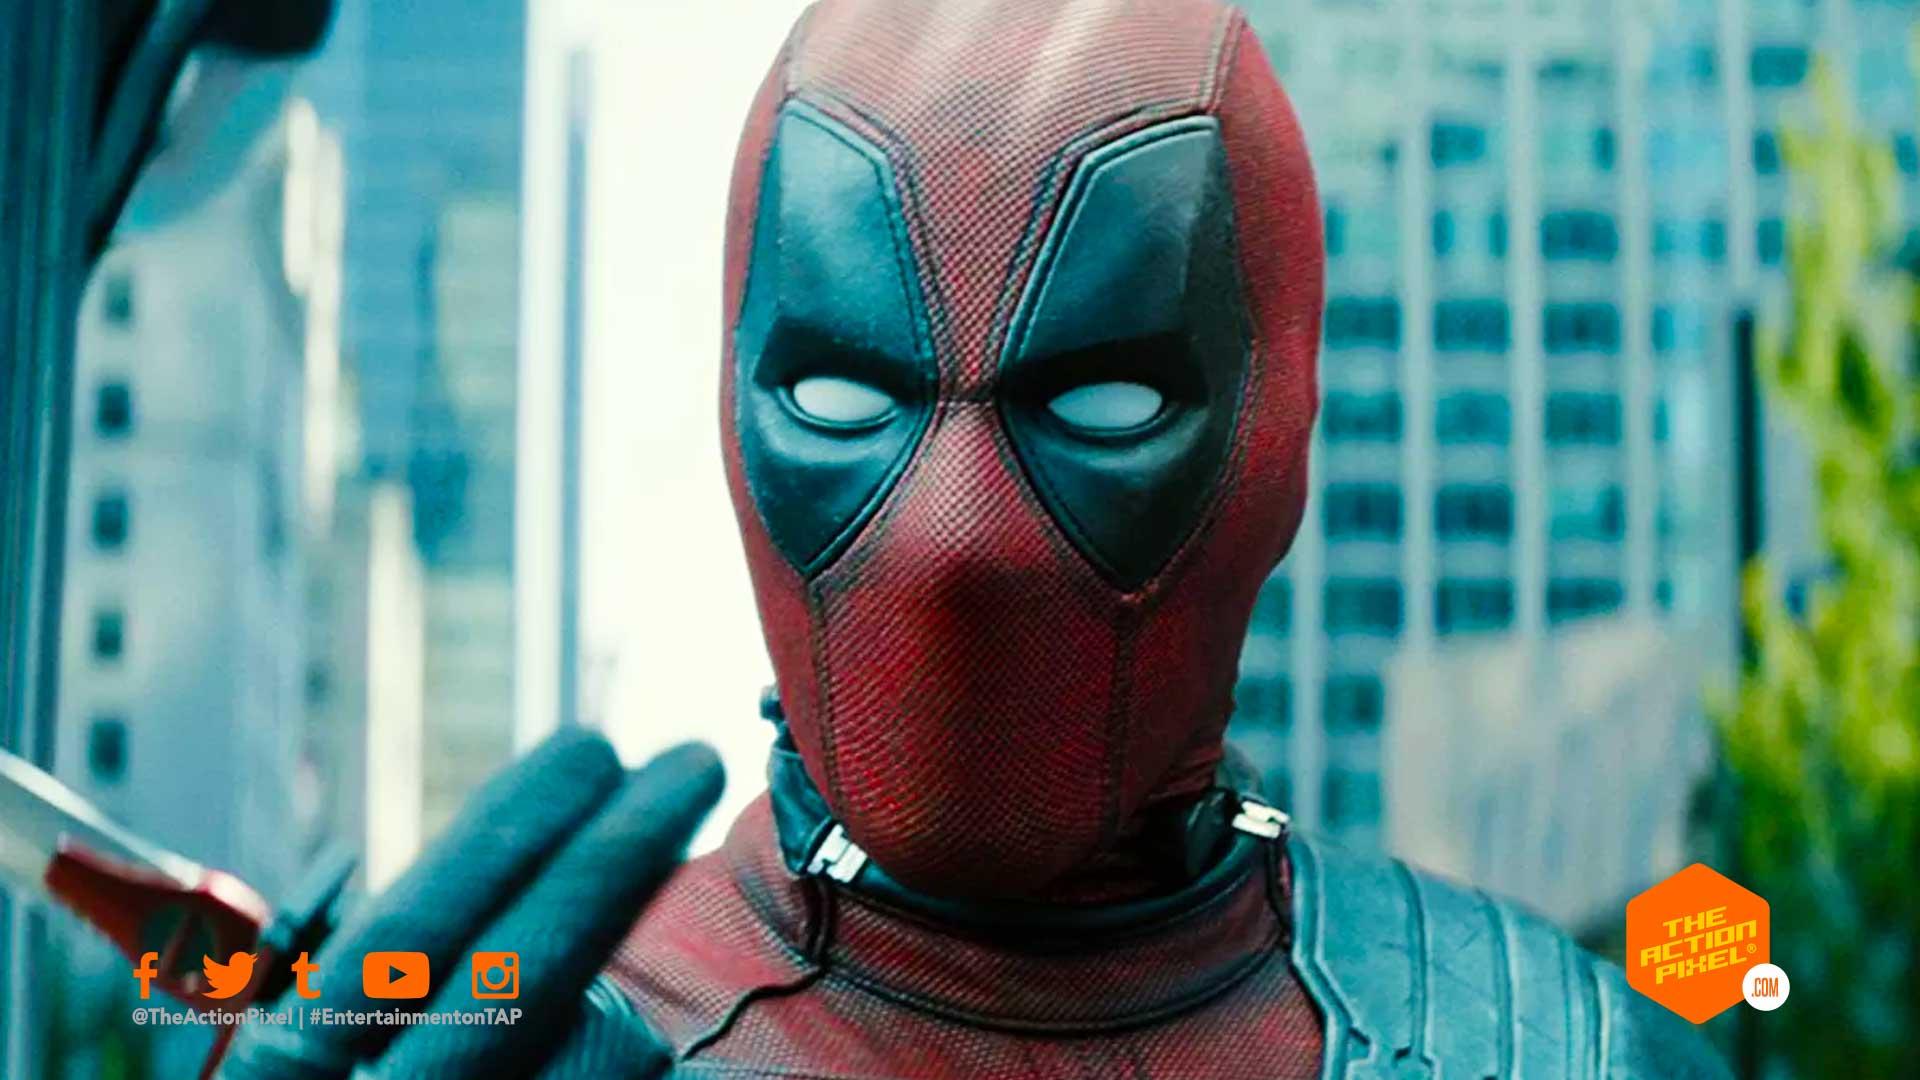 deadpool, deadpool 3, deadpool 3 movie, featured, marvel, 20th fox studios, marvel studios, 20th century studios,